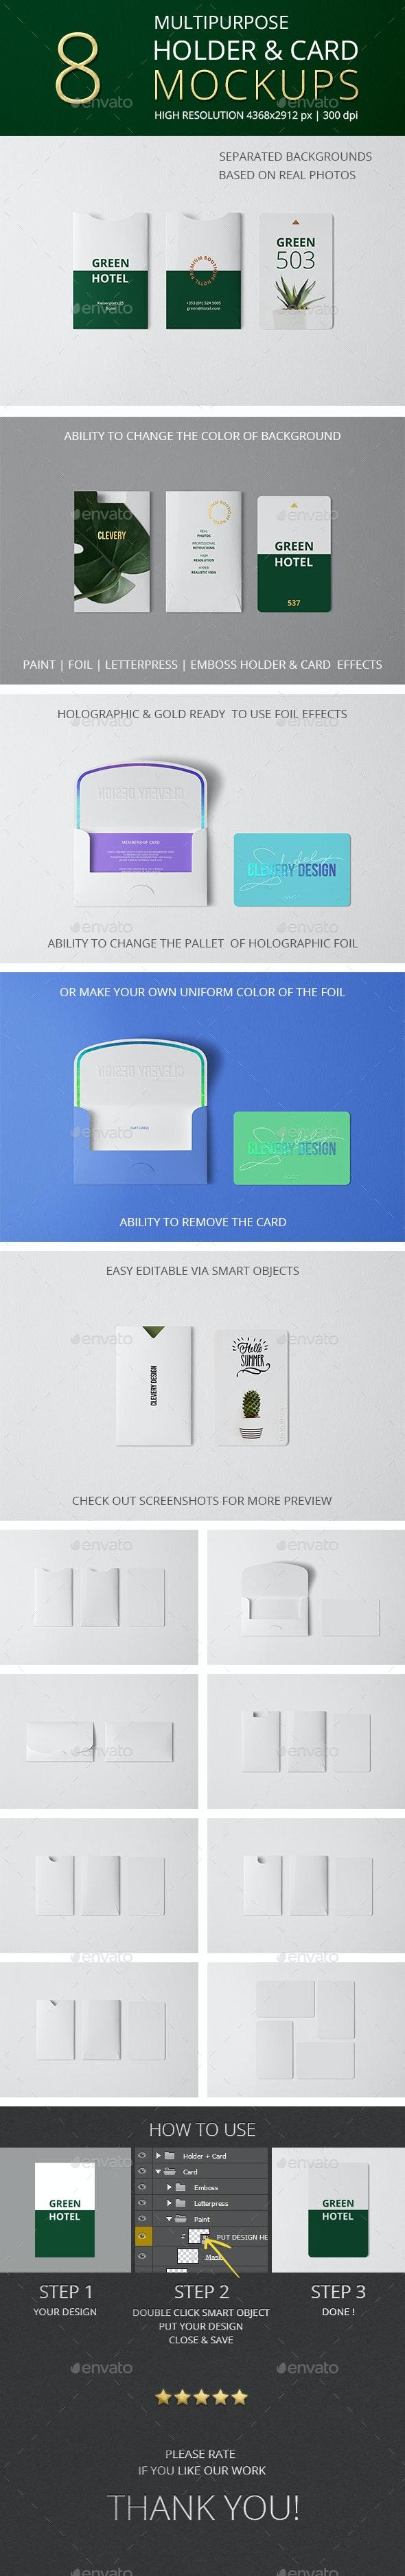 Multipurpose Holder & Card Mockup Vol 9.0 - Miscellaneous Print